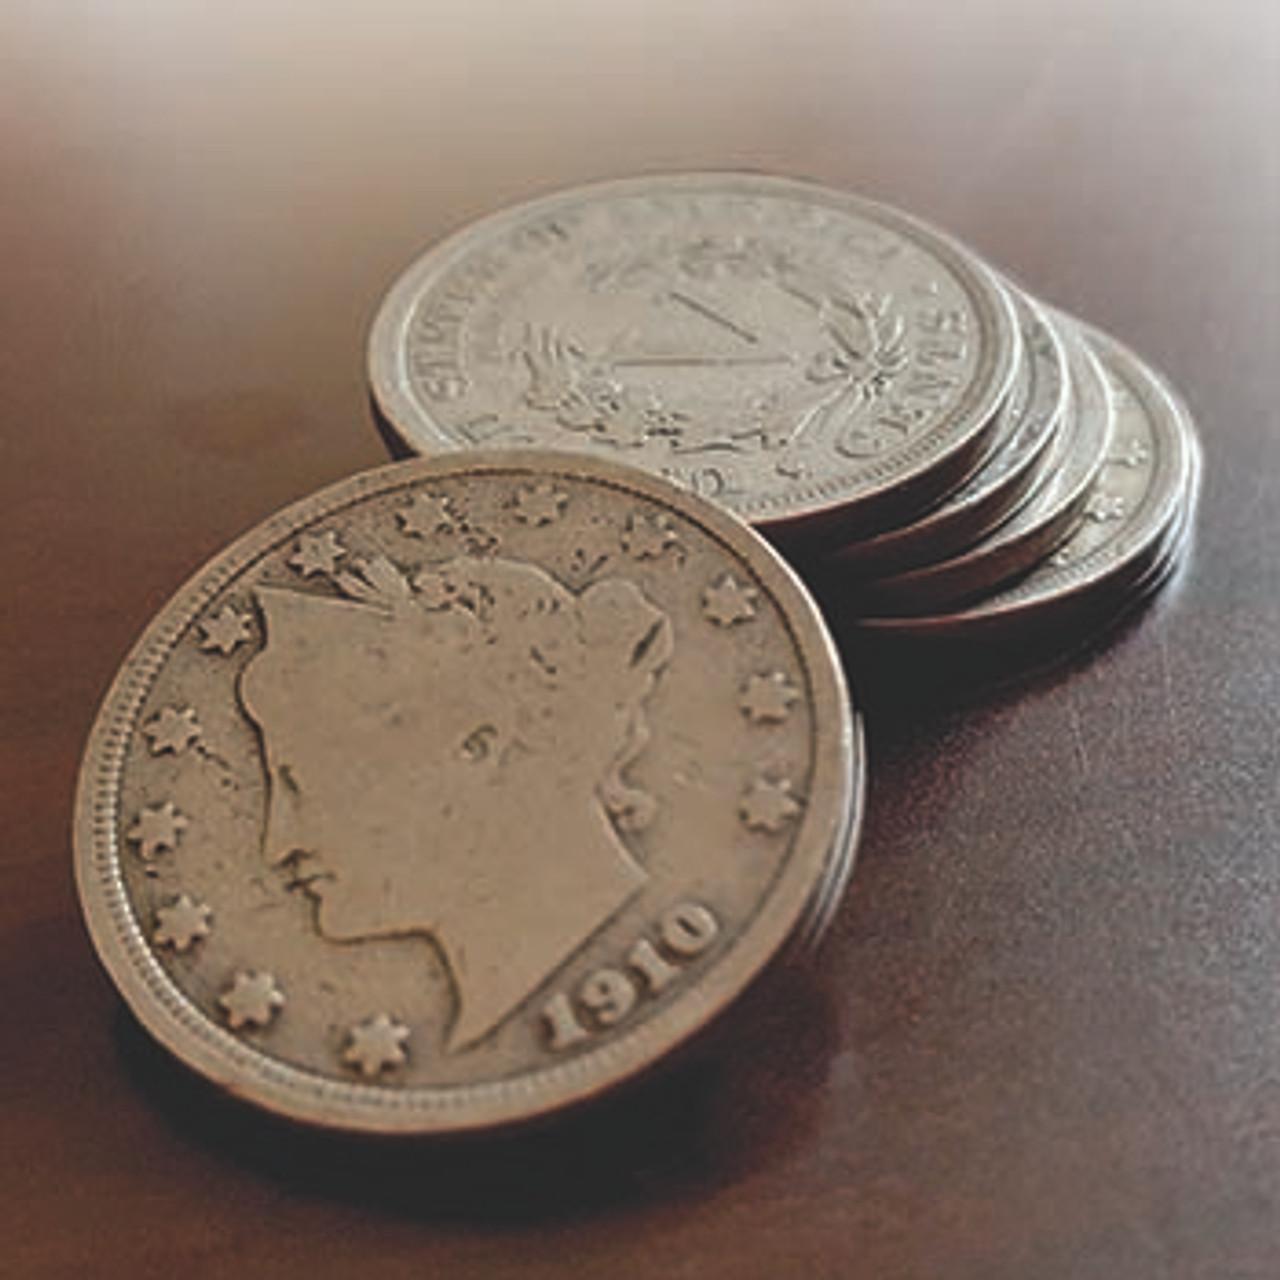 Half Price Swindler's Nickels Image 1